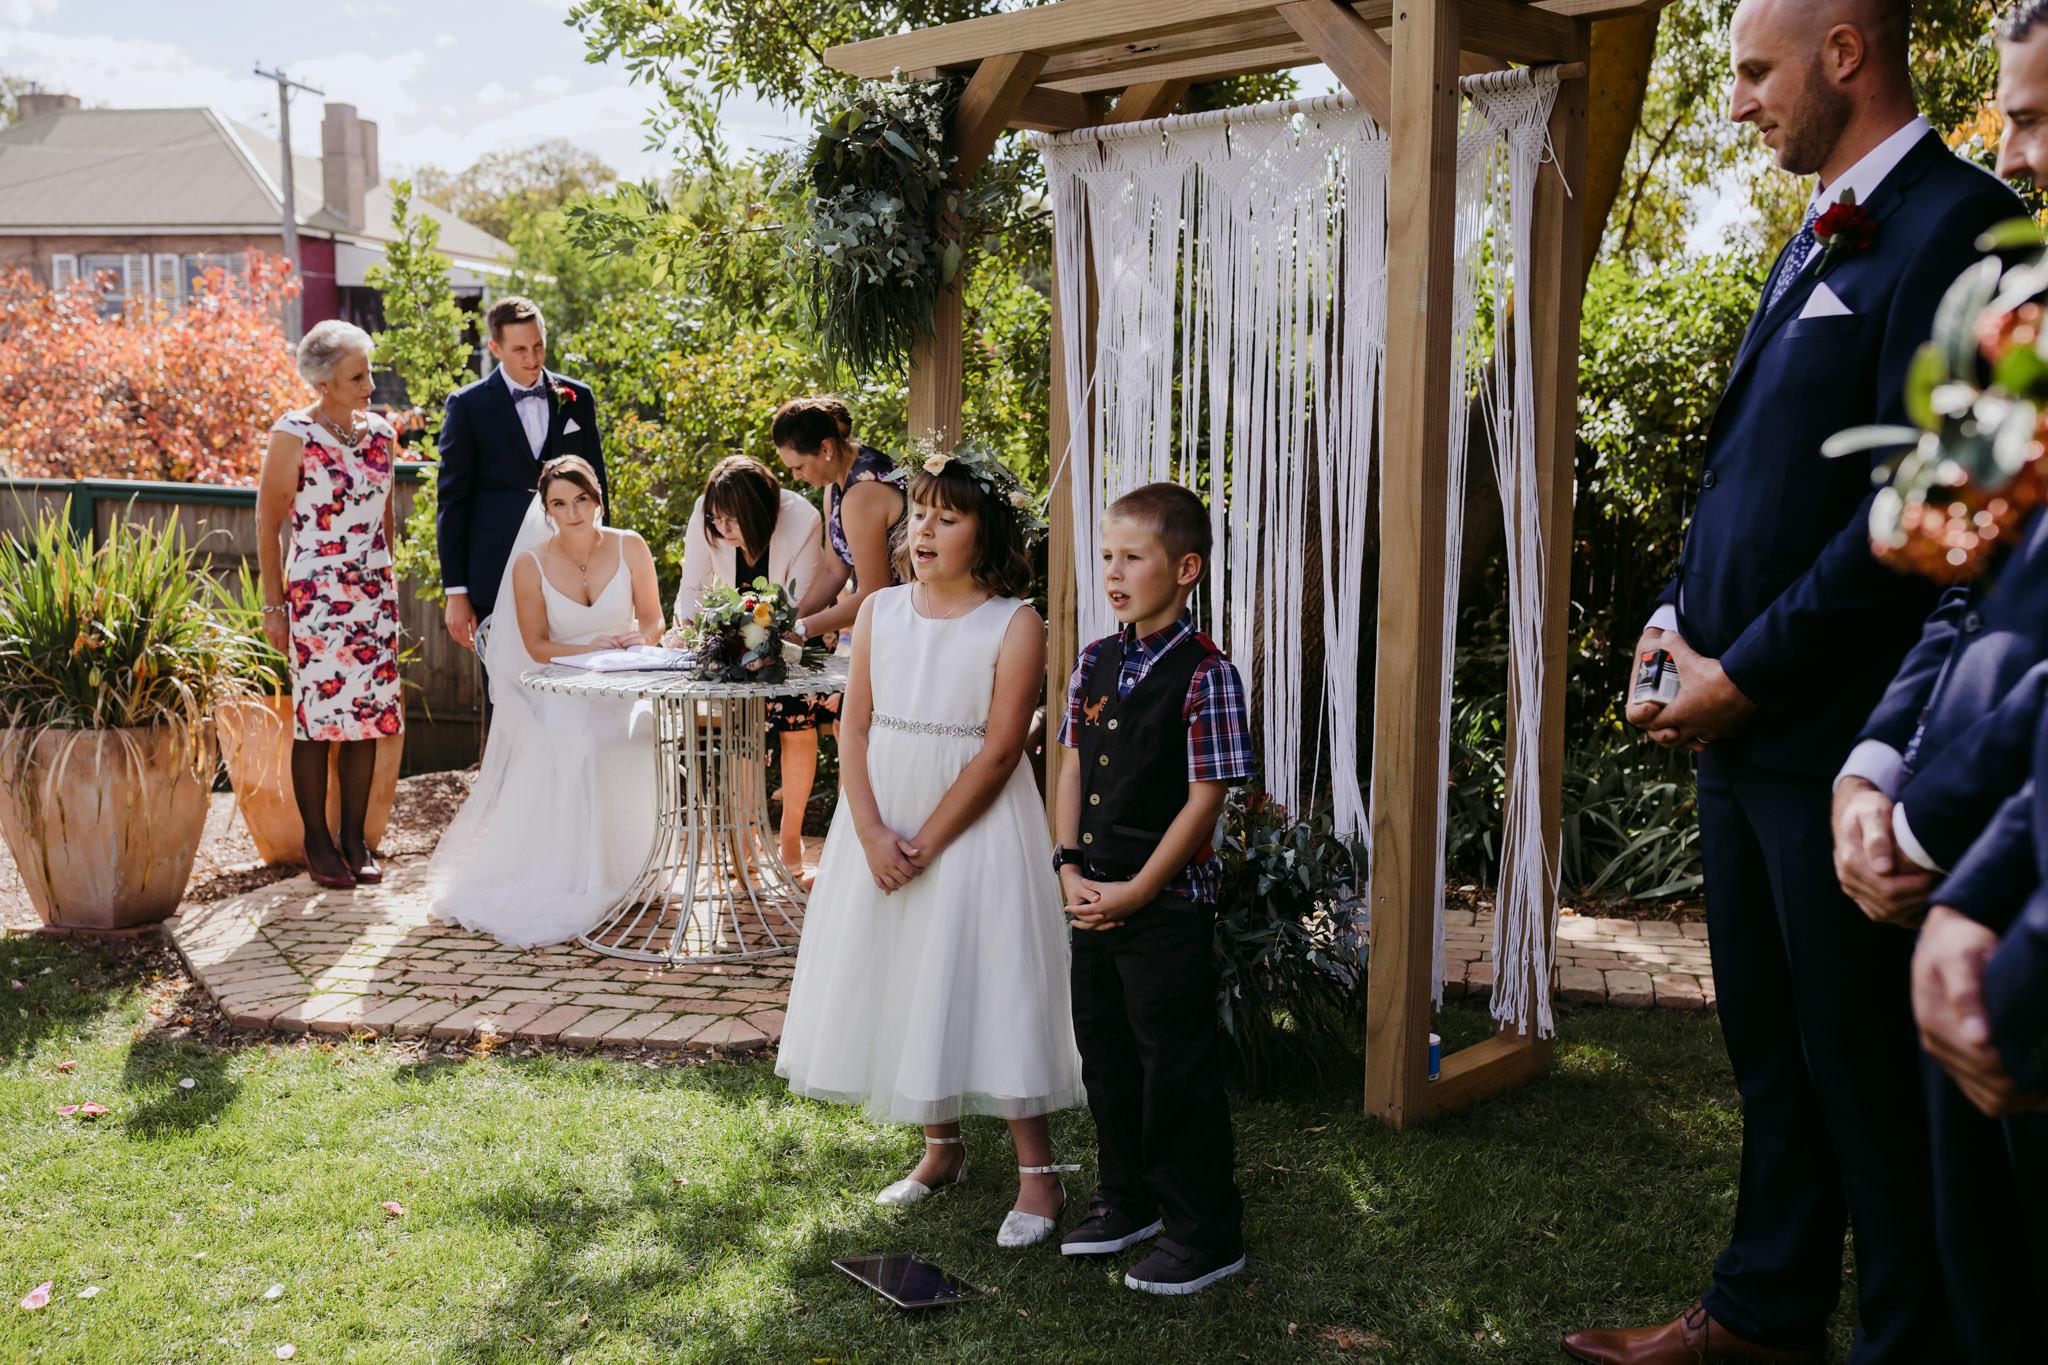 Erin Latimore Mudgee Canberra Wedding Photographer ROSEBANK GUESTHOUSE OLD THEATRE TONIC MILLTHORPE_277.JPG